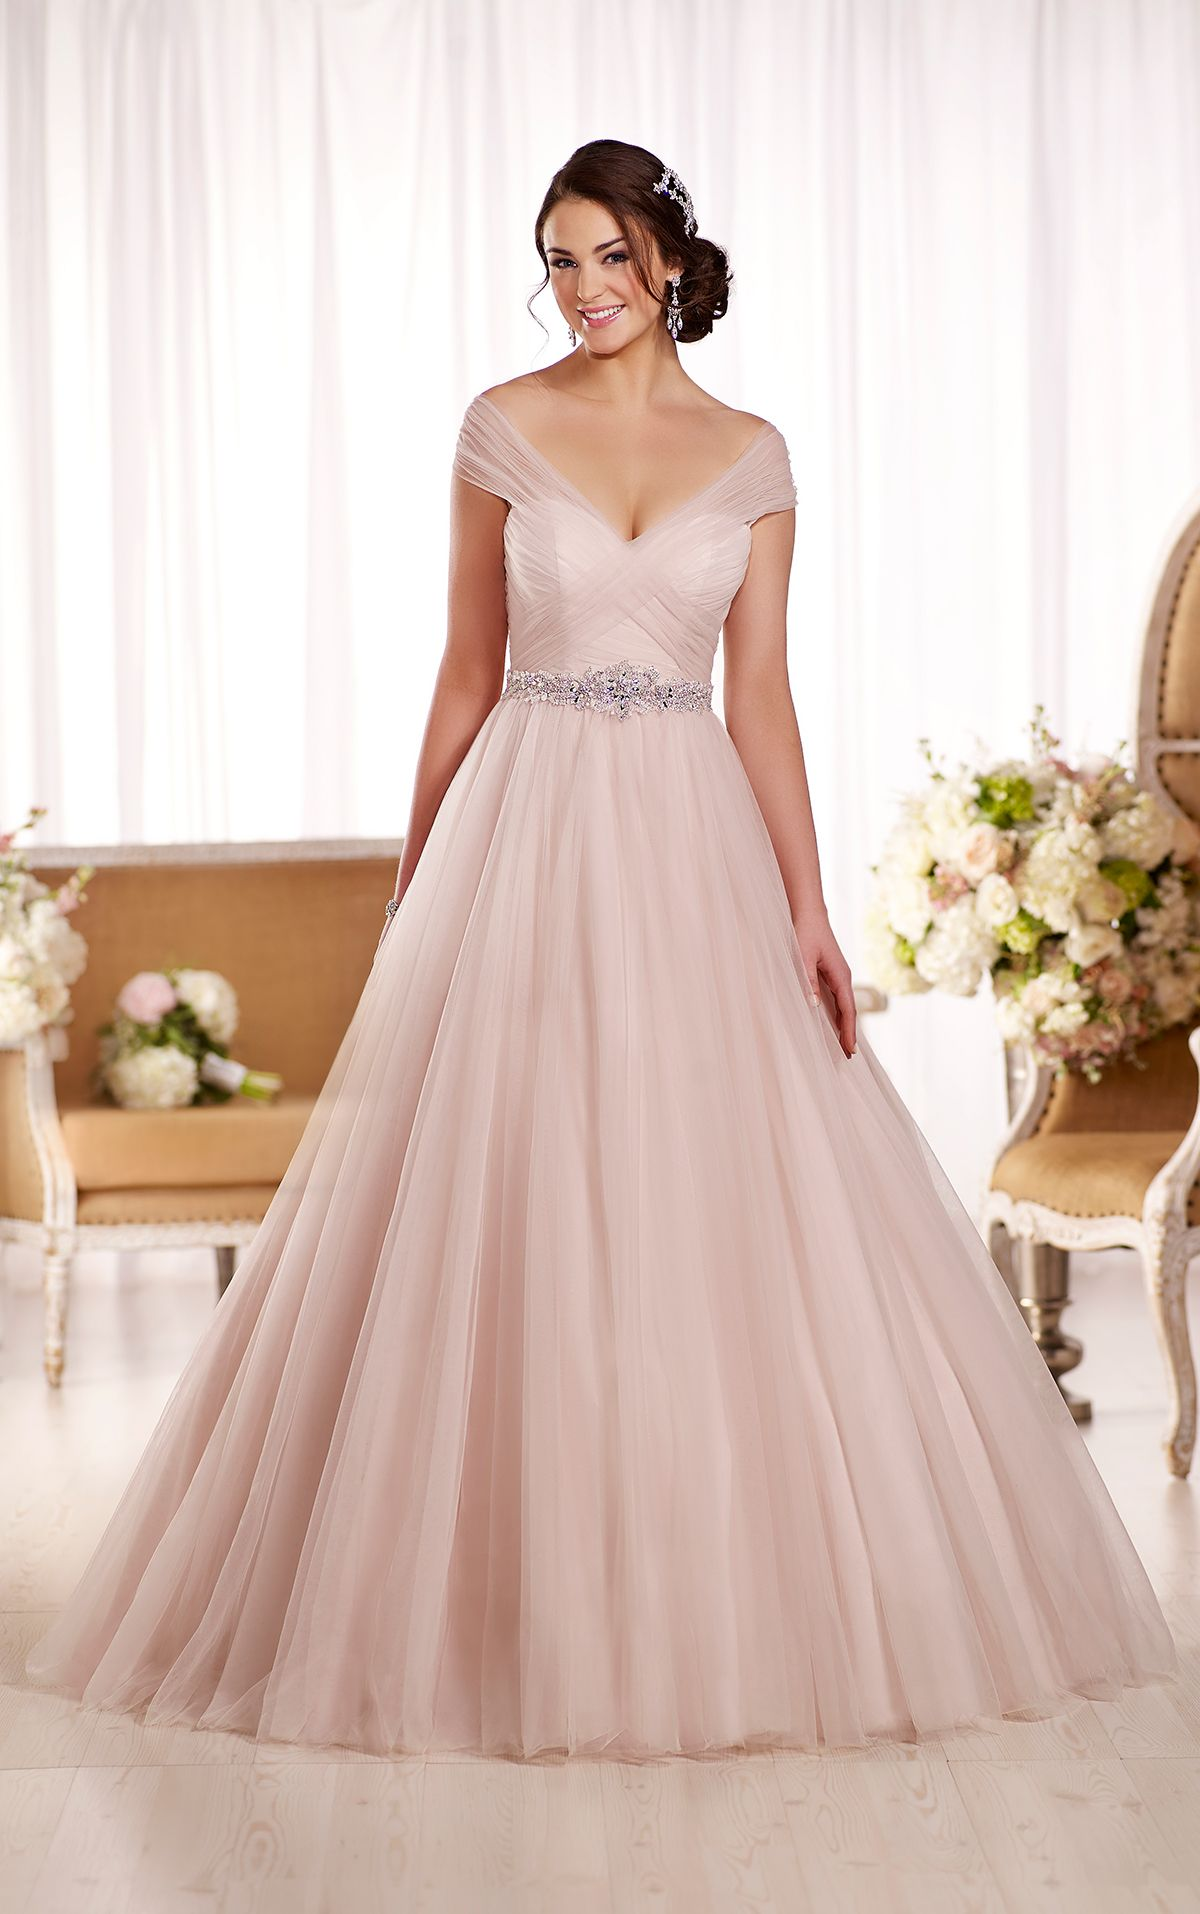 Slimming Wedding Dress by | Australia, Wedding dressses and Wedding ...